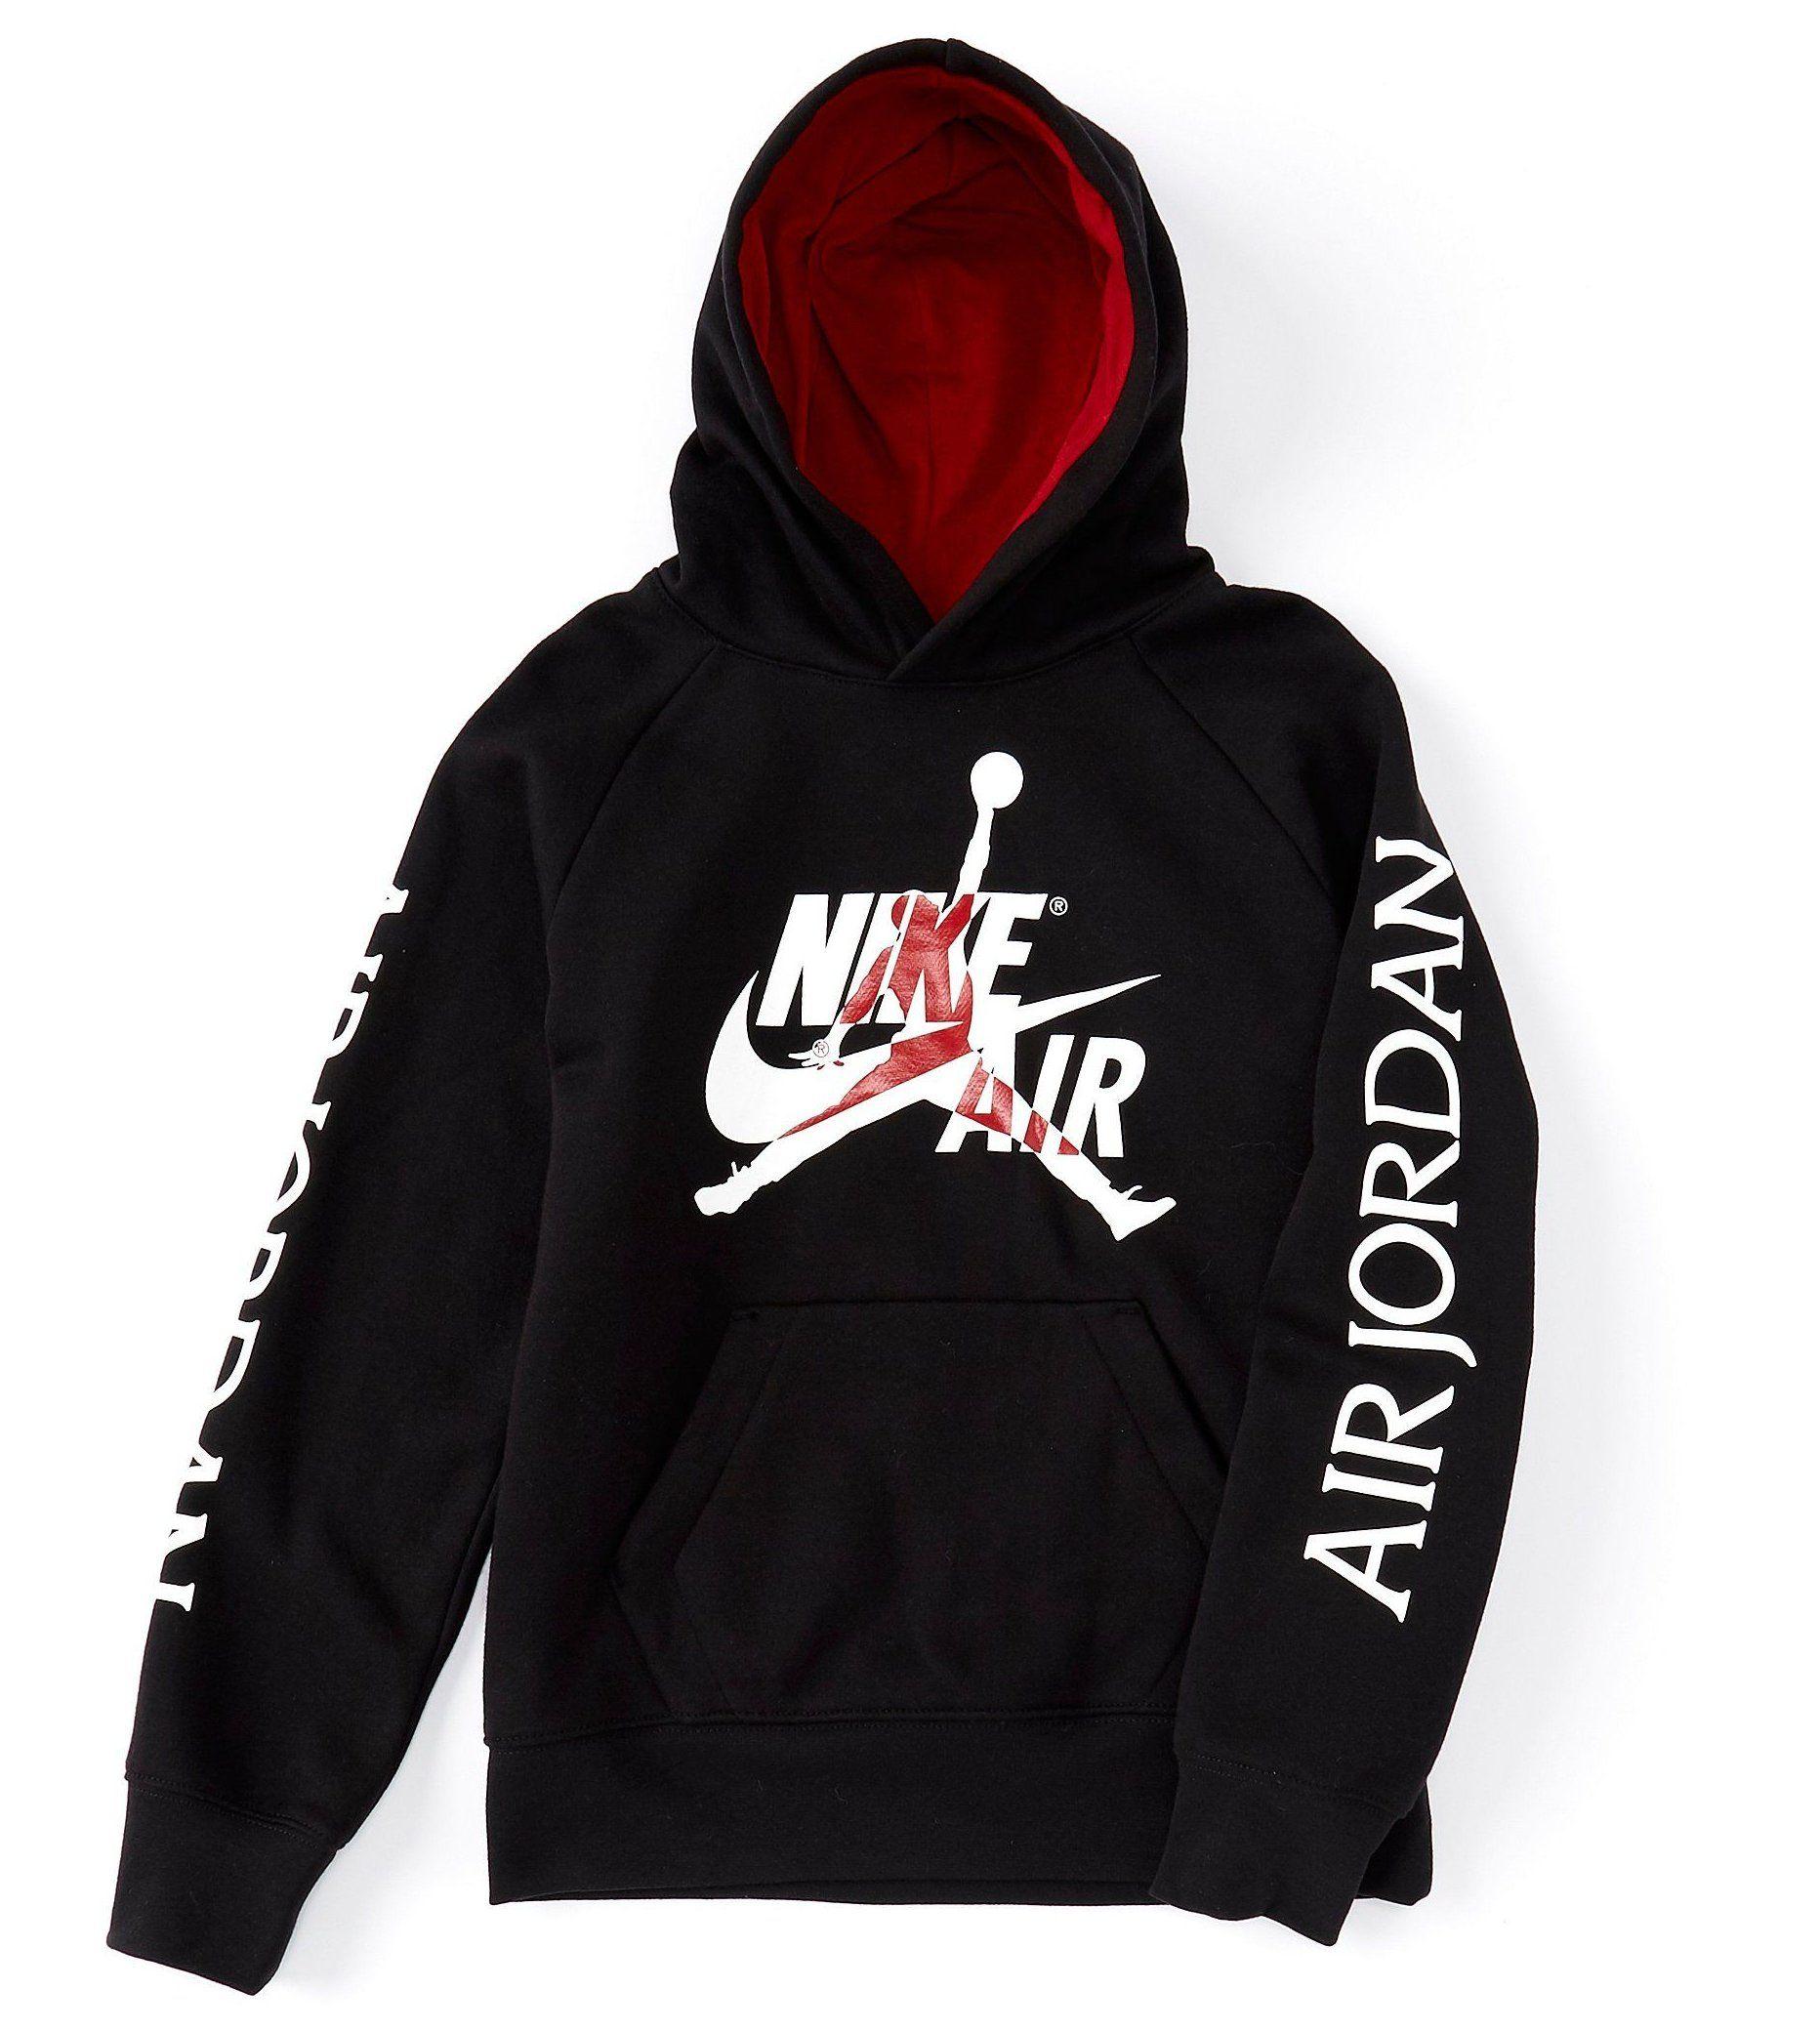 Black And Red Jordan Sweatshirt